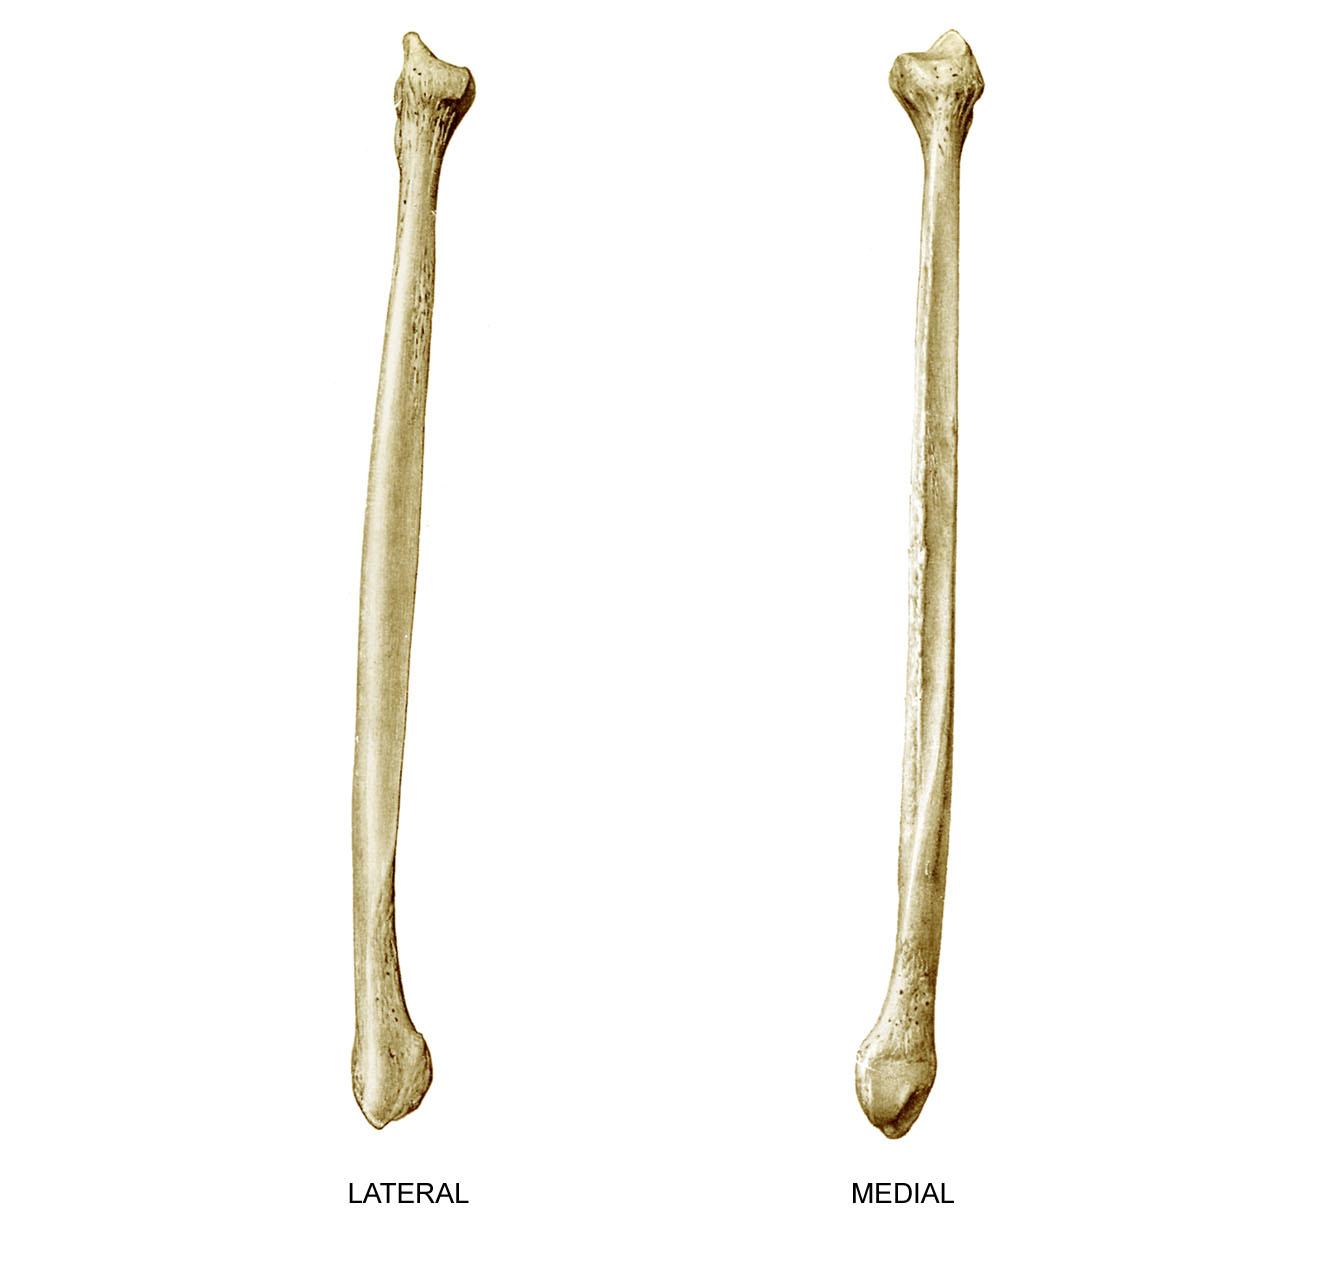 Anatomyexpert Apex Of Head Of The Fibula Structure Detail